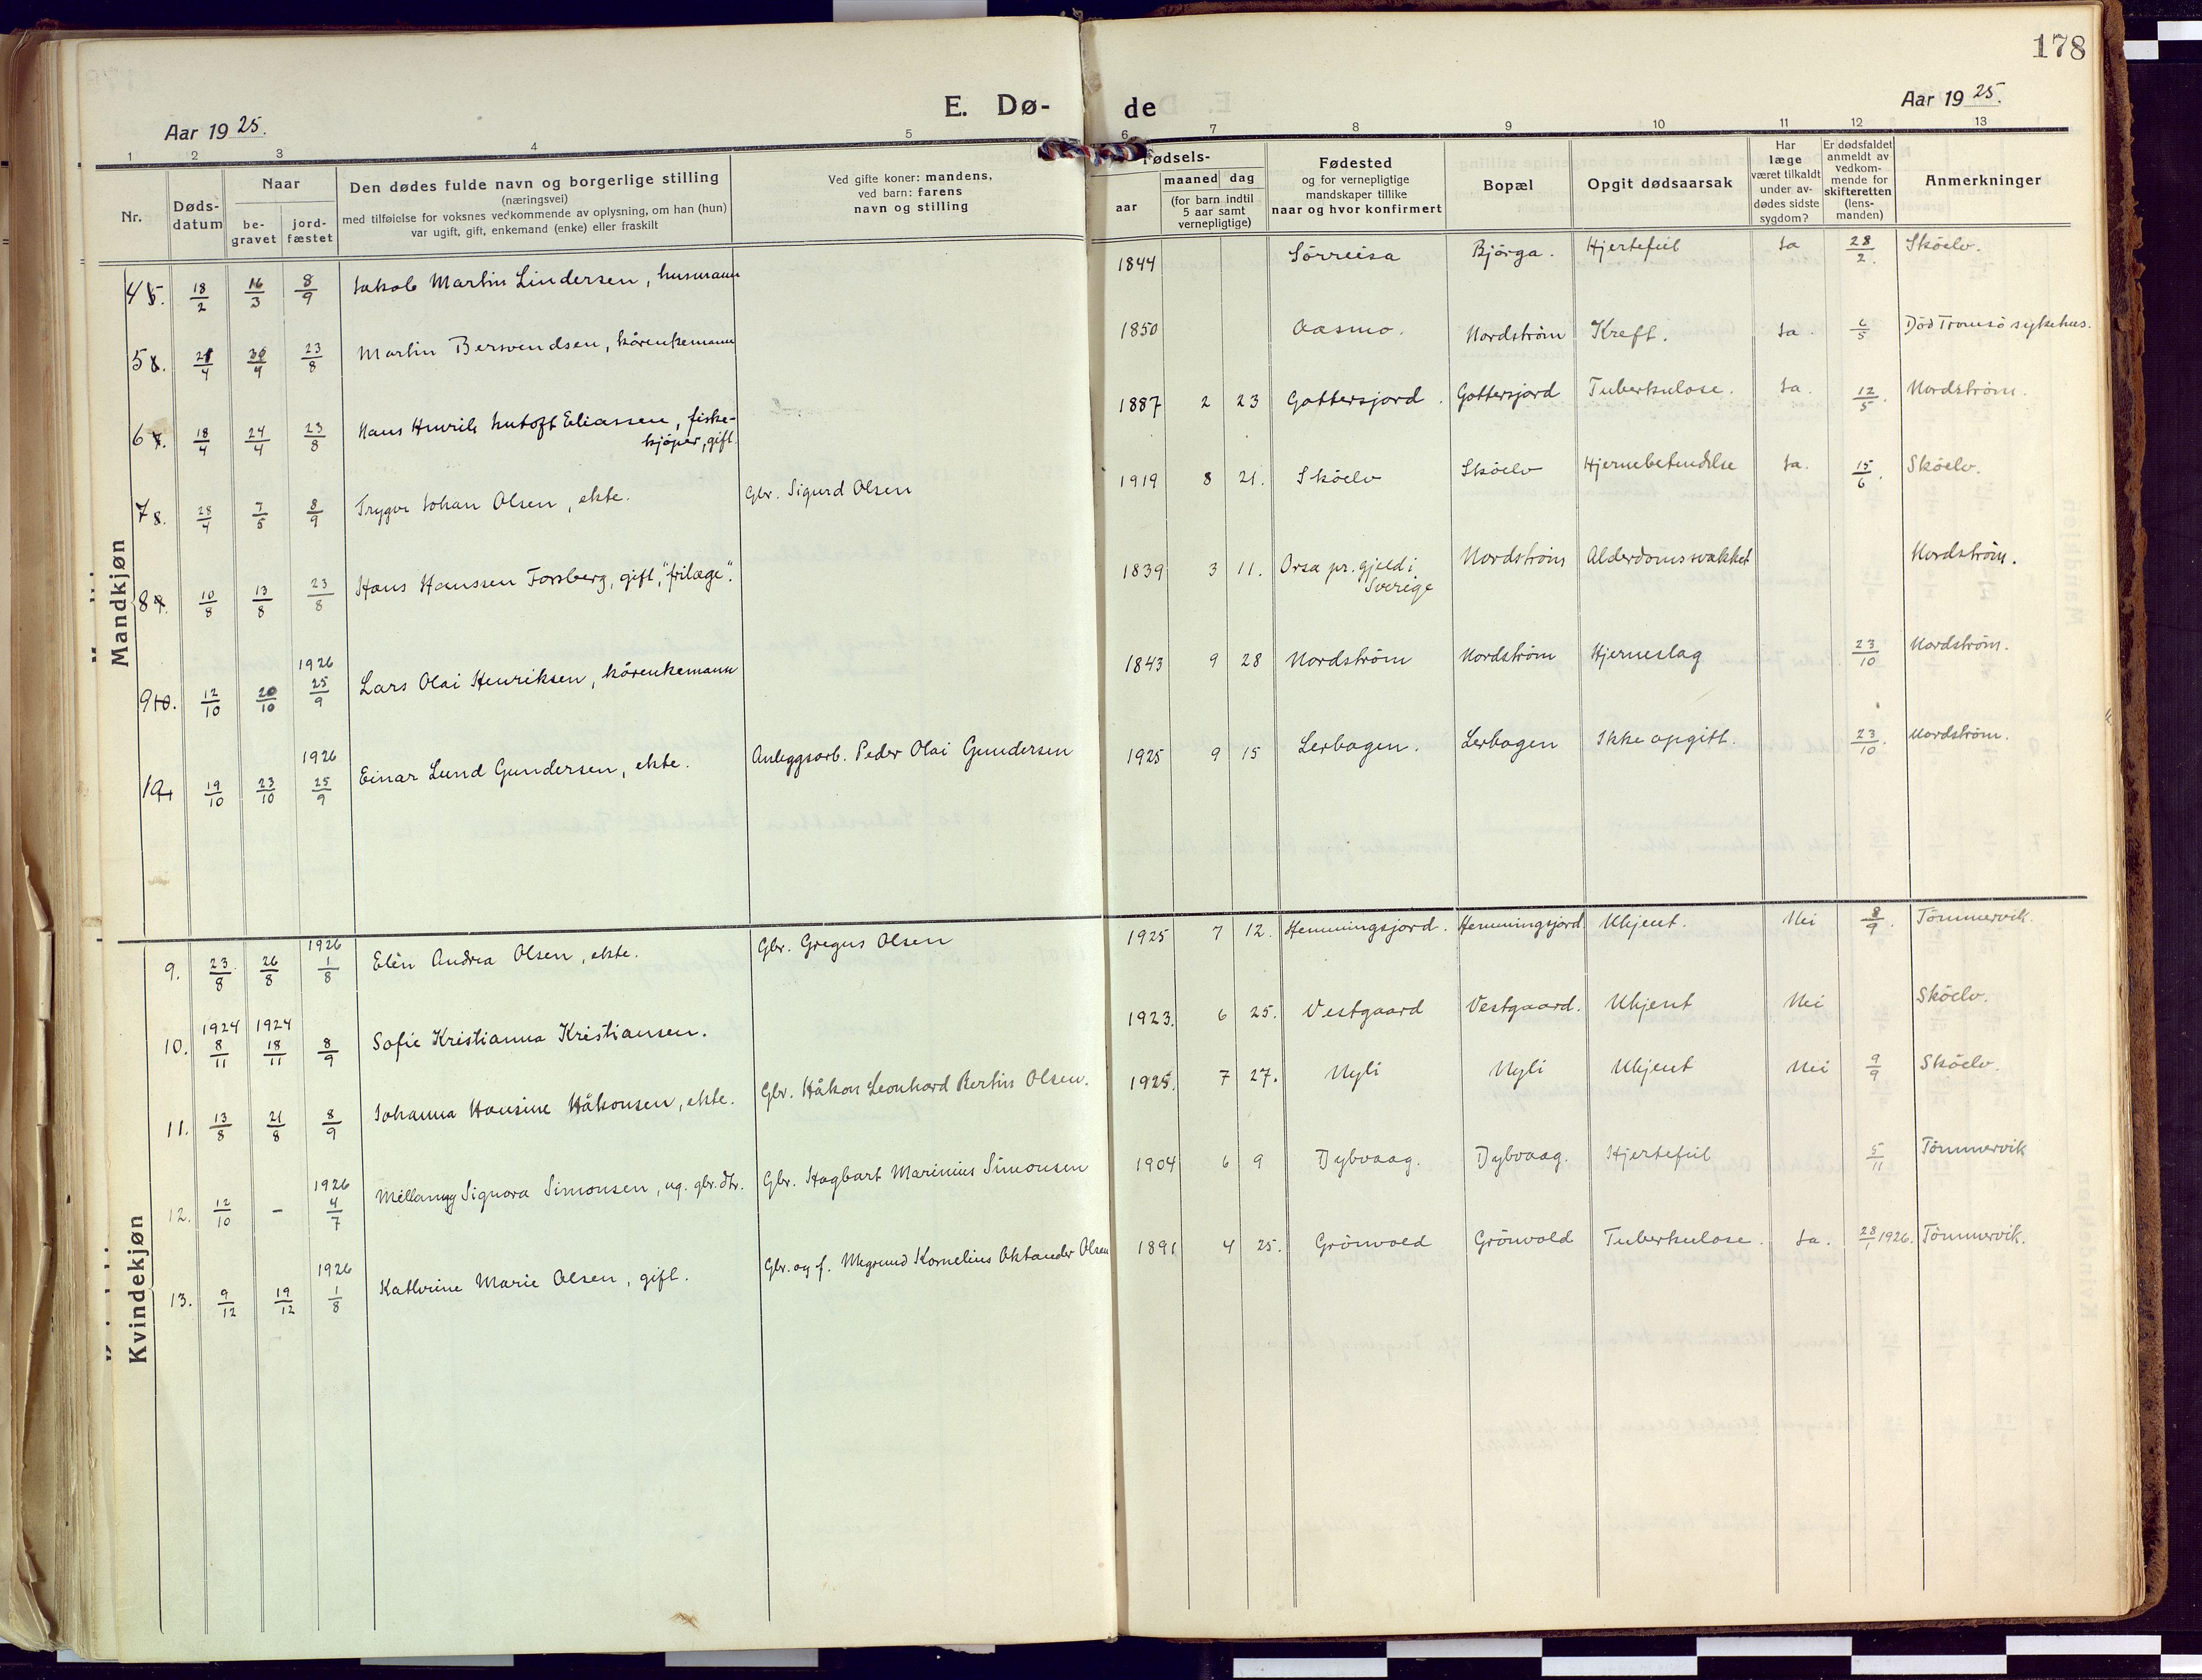 SATØ, Tranøy sokneprestkontor, I/Ia/Iaa/L0015kirke: Ministerialbok nr. 15, 1919-1928, s. 178